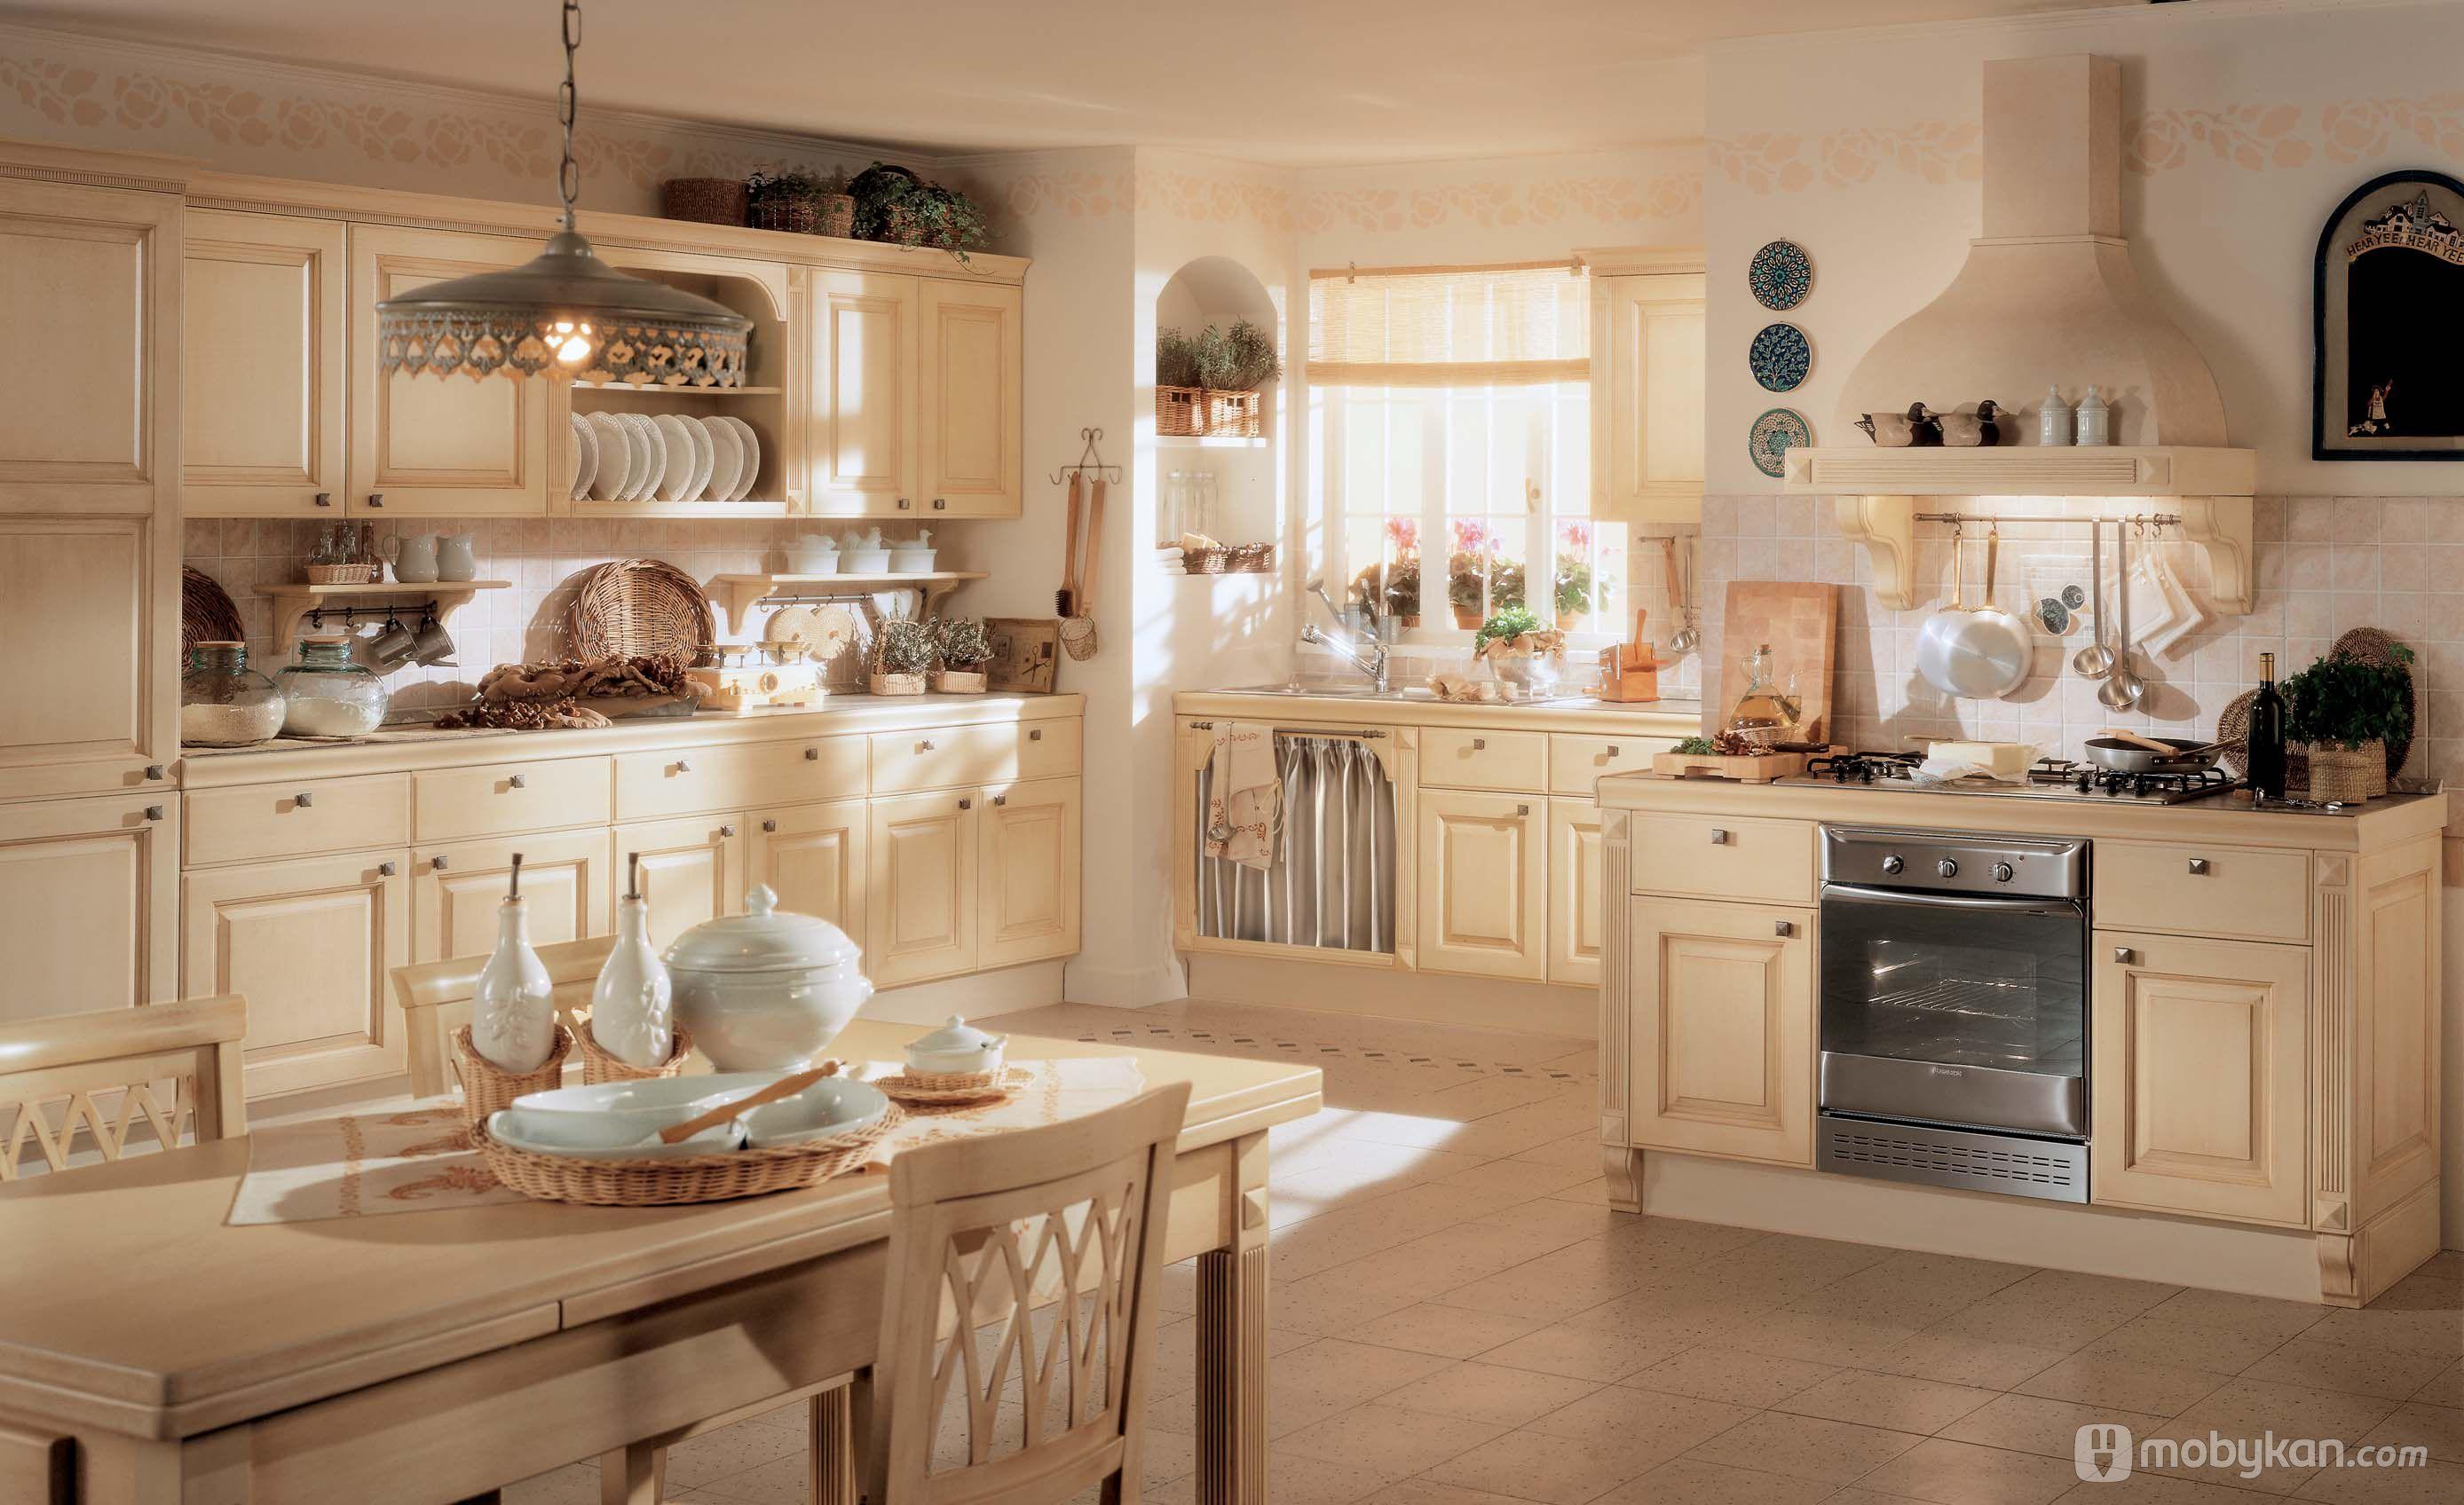 صور مطابخ حديثه و اشكال مطابخ مودرن و مميزه من موبيكان Classic Kitchen Design Modern Kitchen Furniture Classic Kitchens